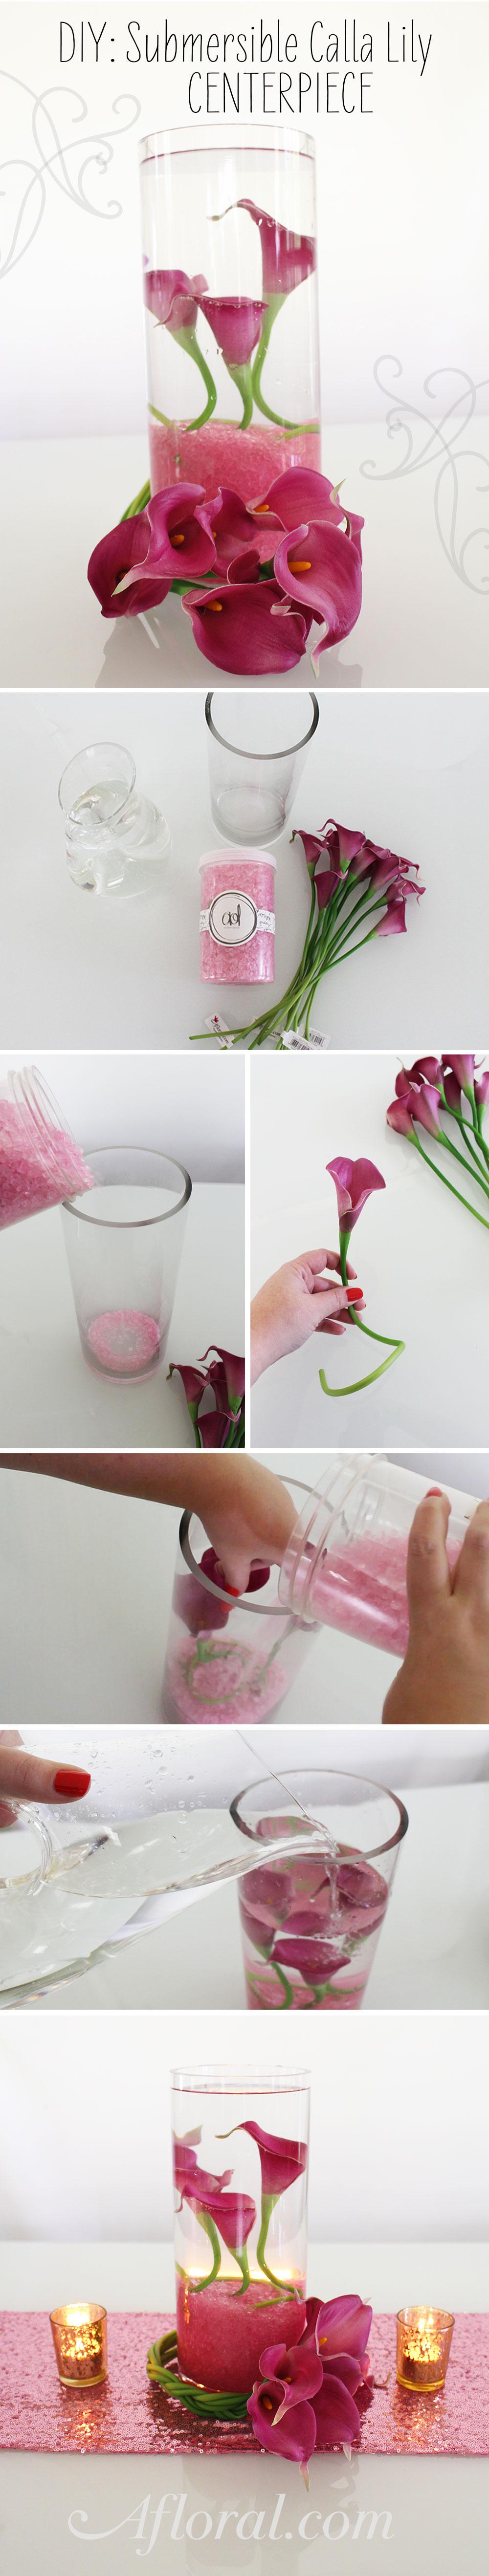 DIY Wedding Centerpiece Ideas from Make your